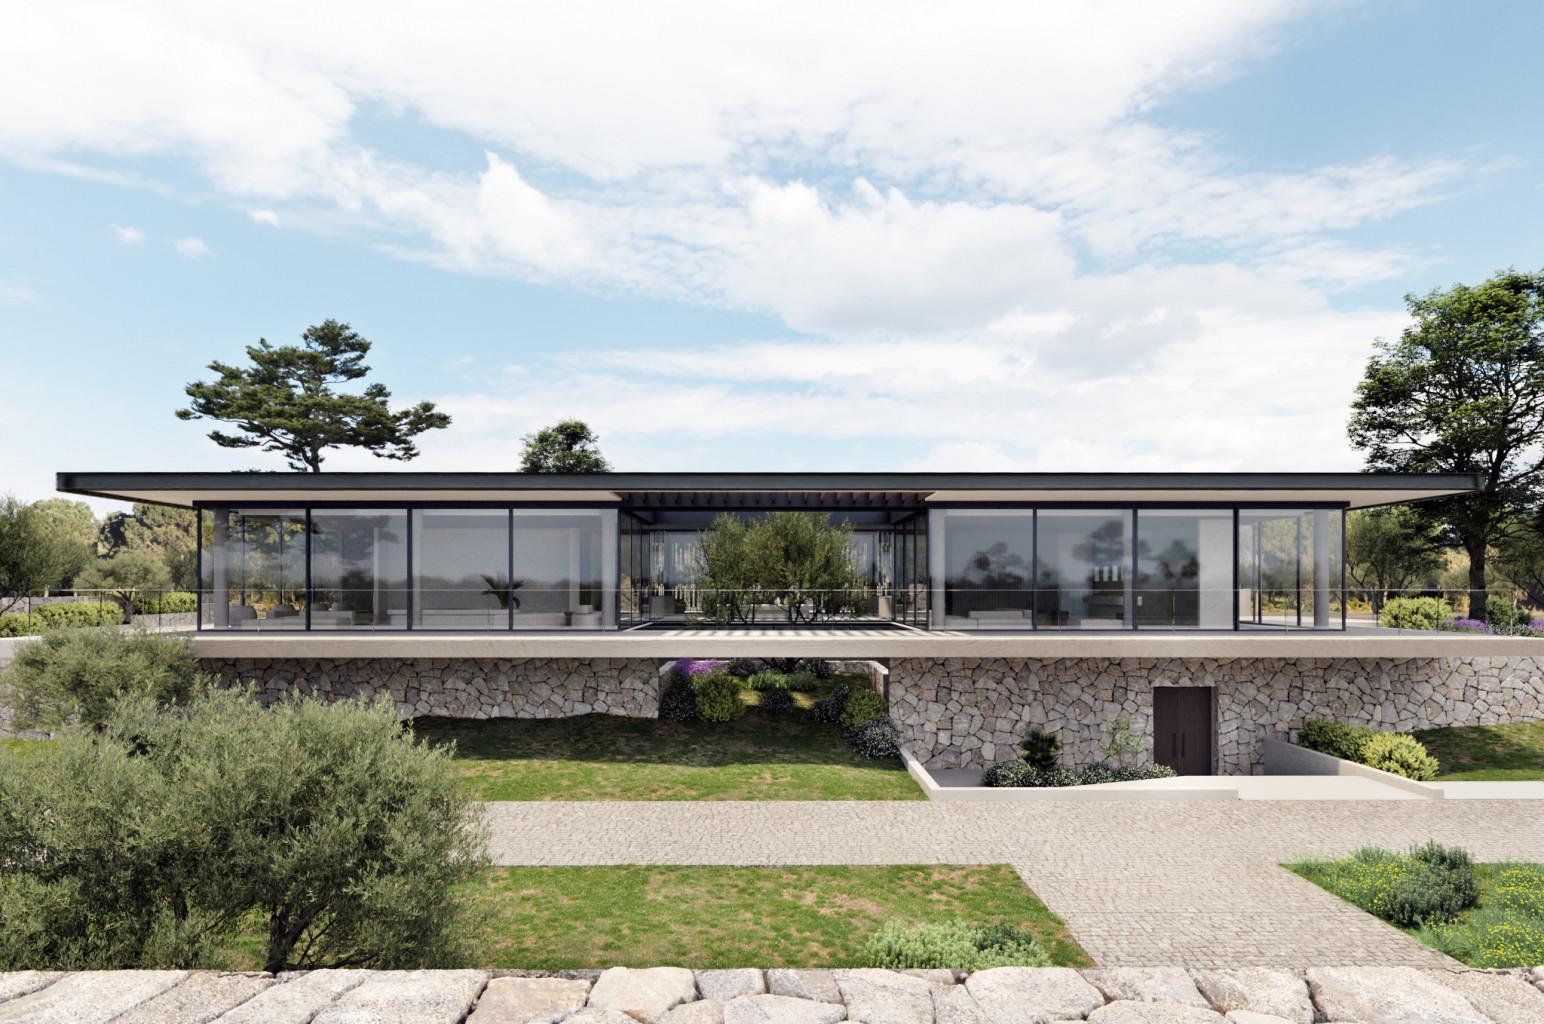 The Olivar Suites #3